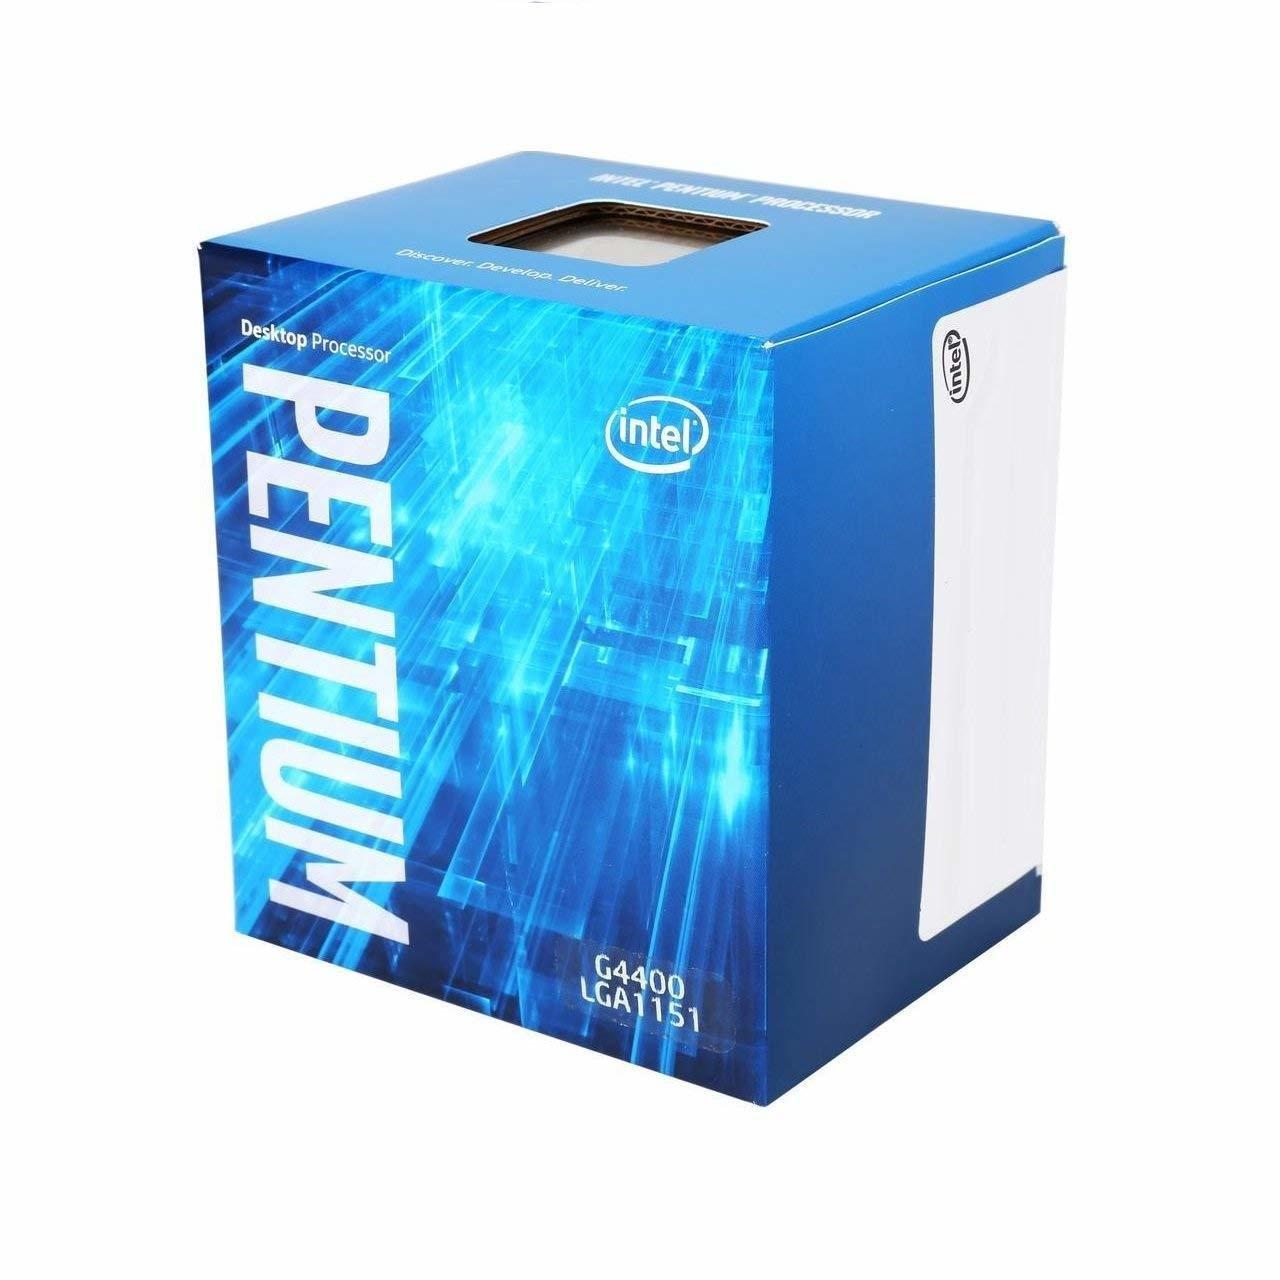 Intel Pentium G4400 Skylake Dual-Core 3.3GHz Desktop Processor TGISCTC00008